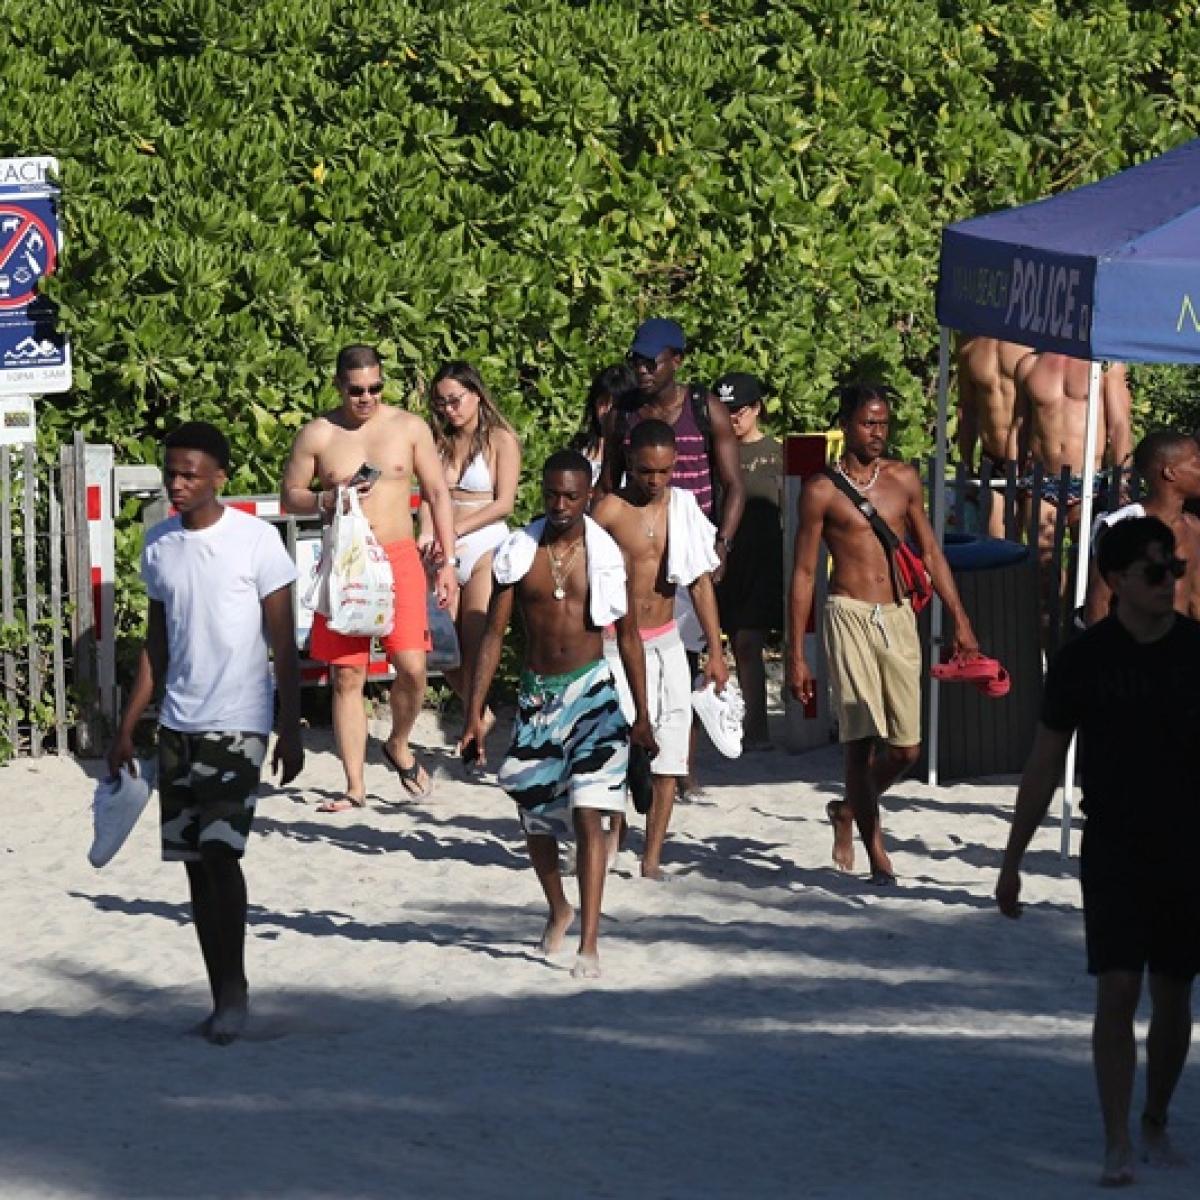 America's Stupidity Epidemic: Spring-breakers defy coronavirus lockdown at Maimi beach